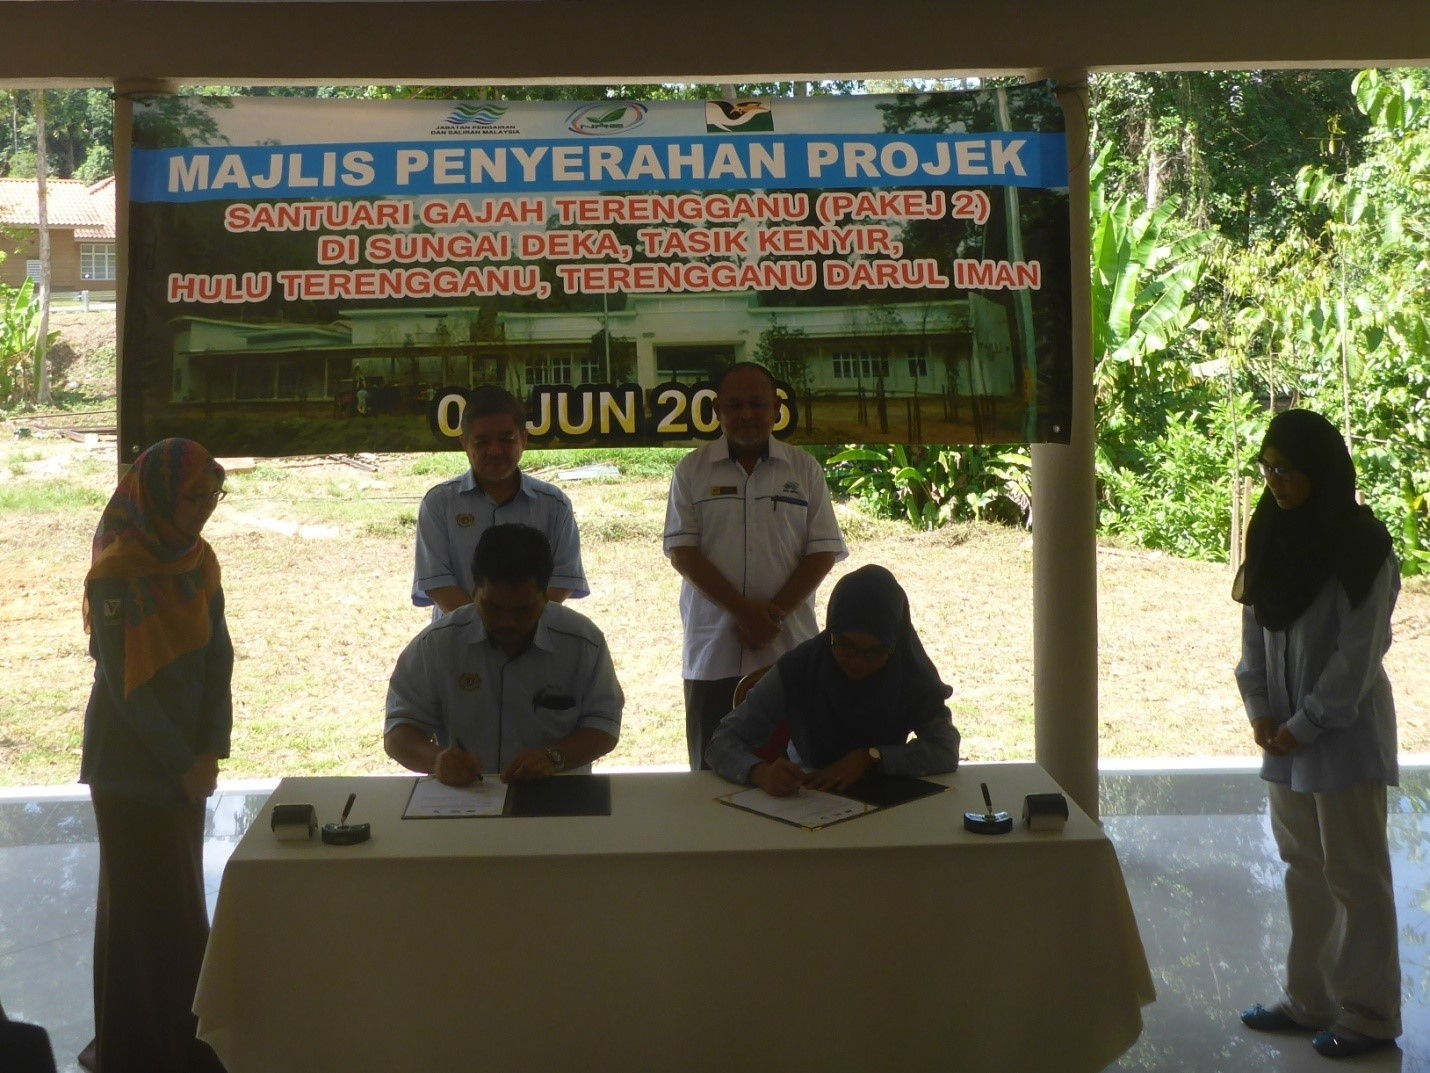 Majlis Penyerahan Pusat Konservasi Gajah Sungai Deka Di